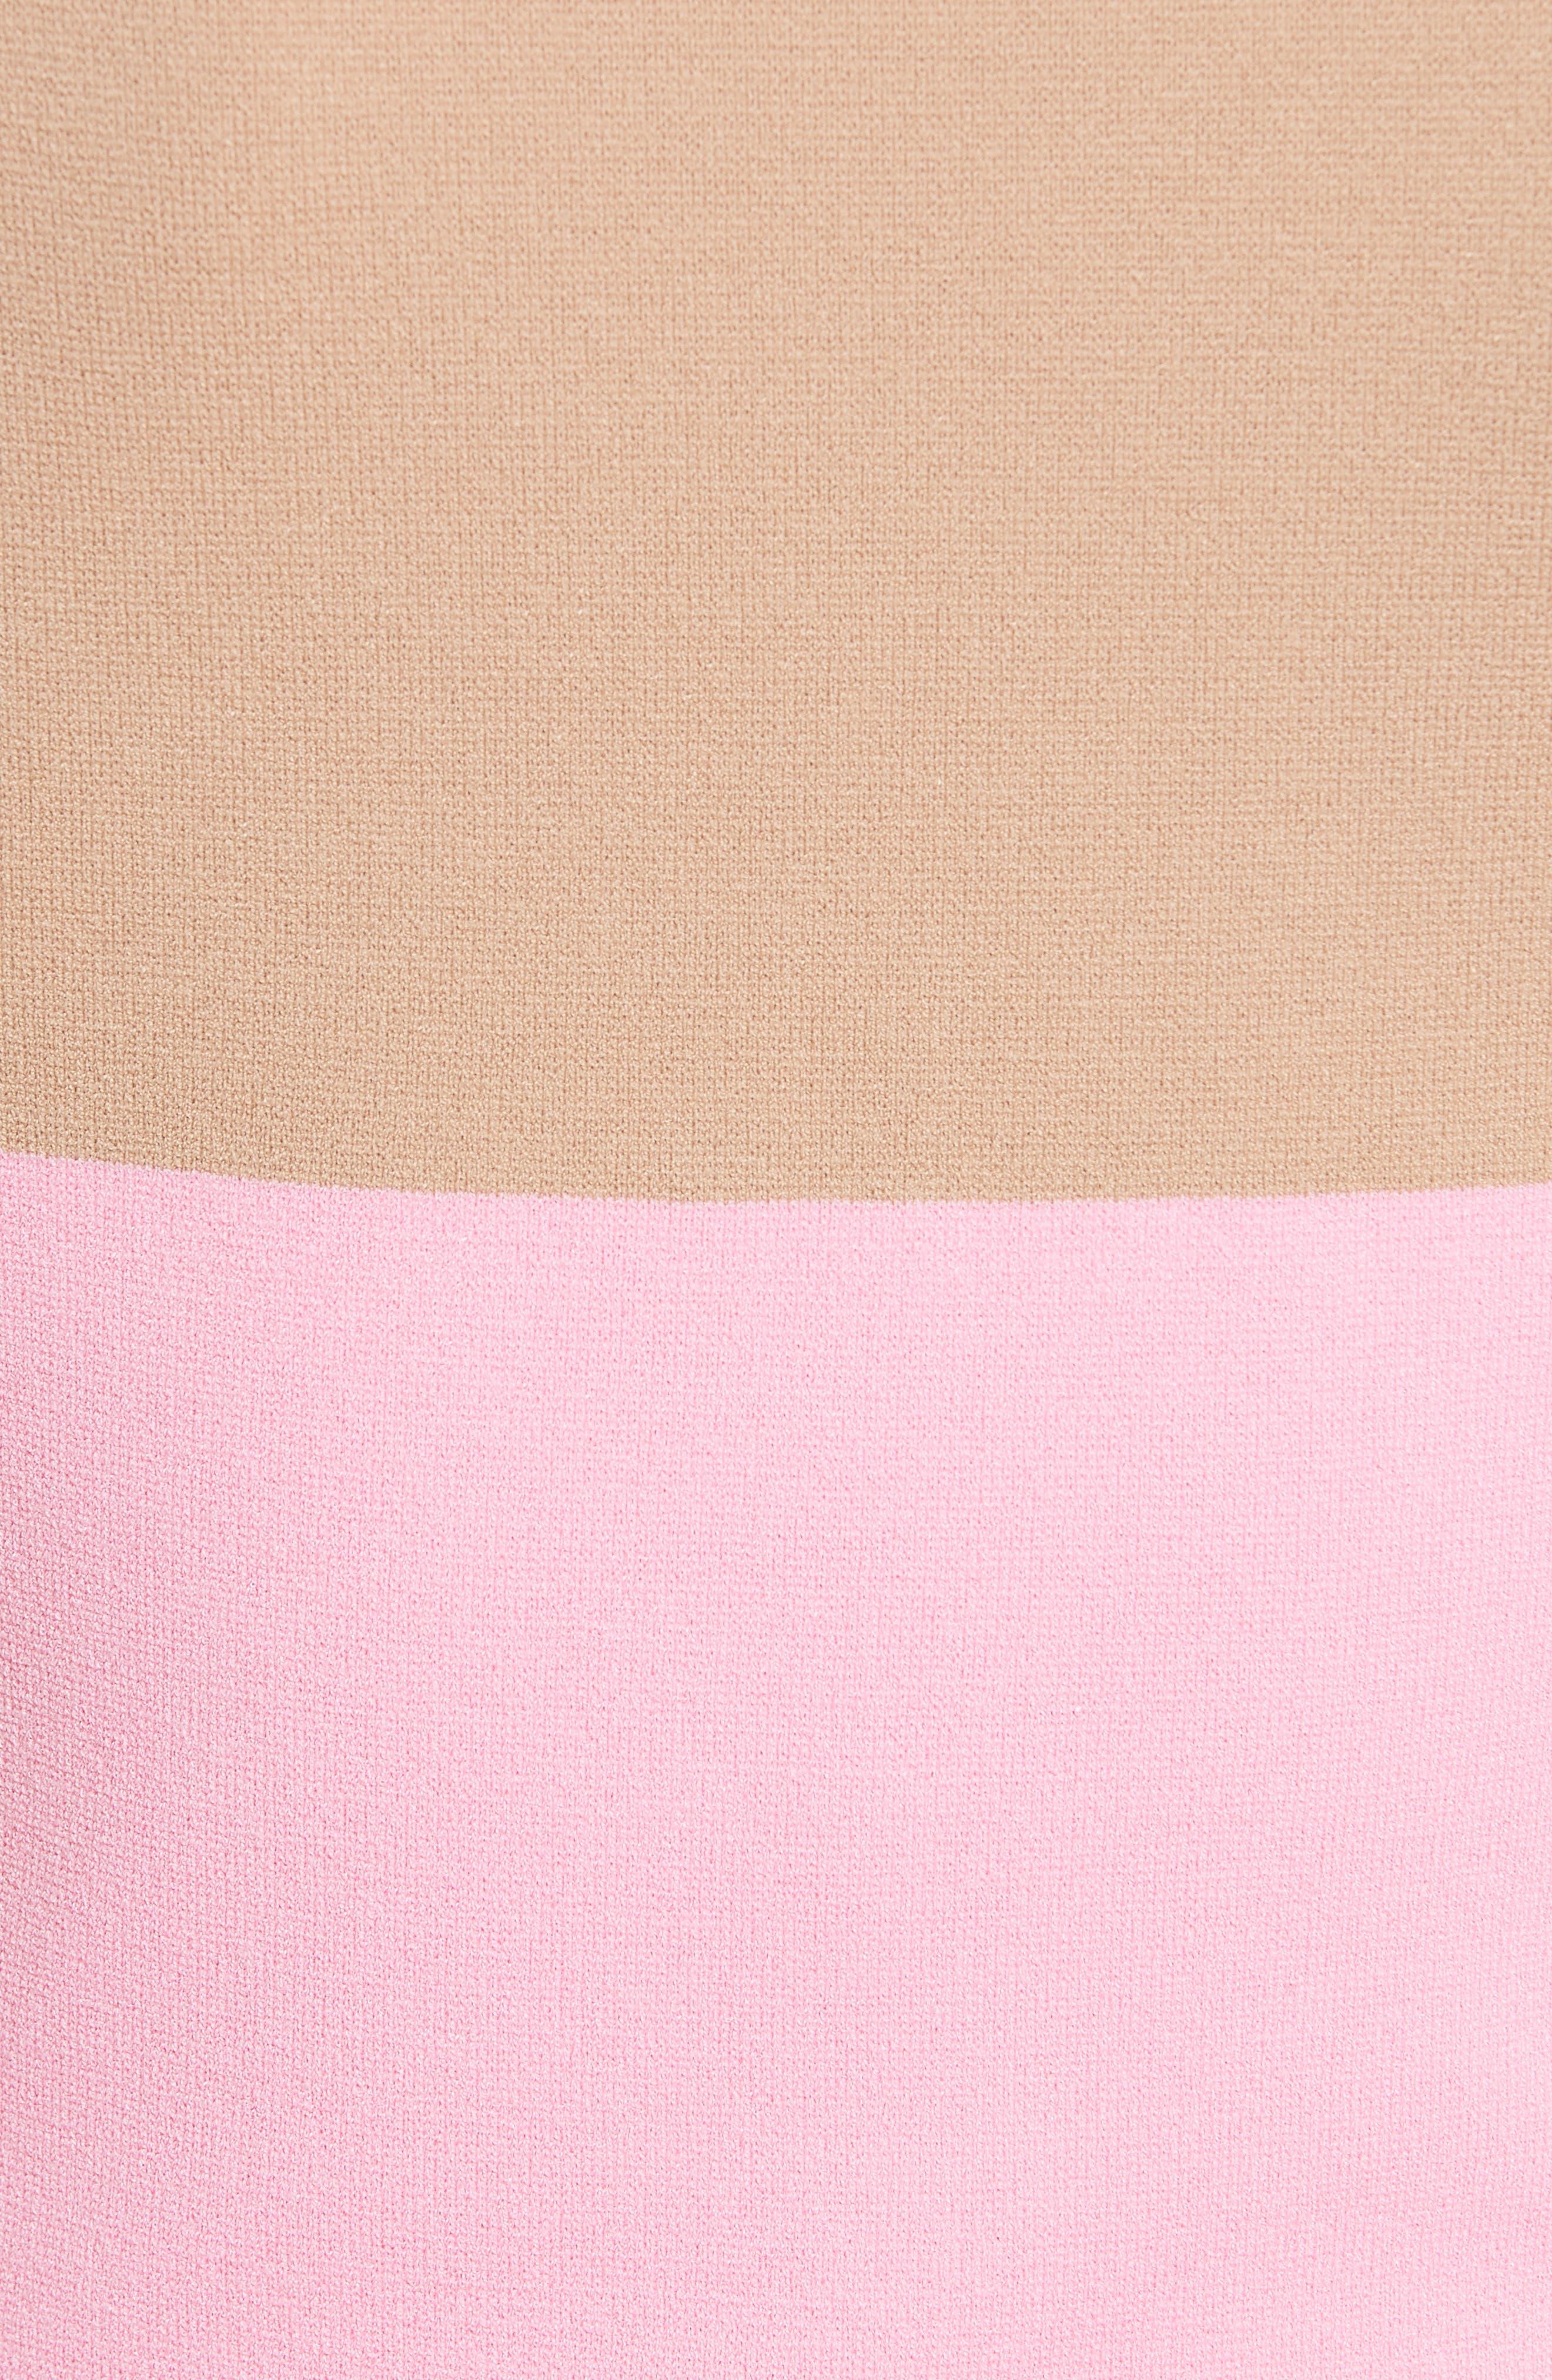 Colorblock Knit Dress,                             Alternate thumbnail 5, color,                             643